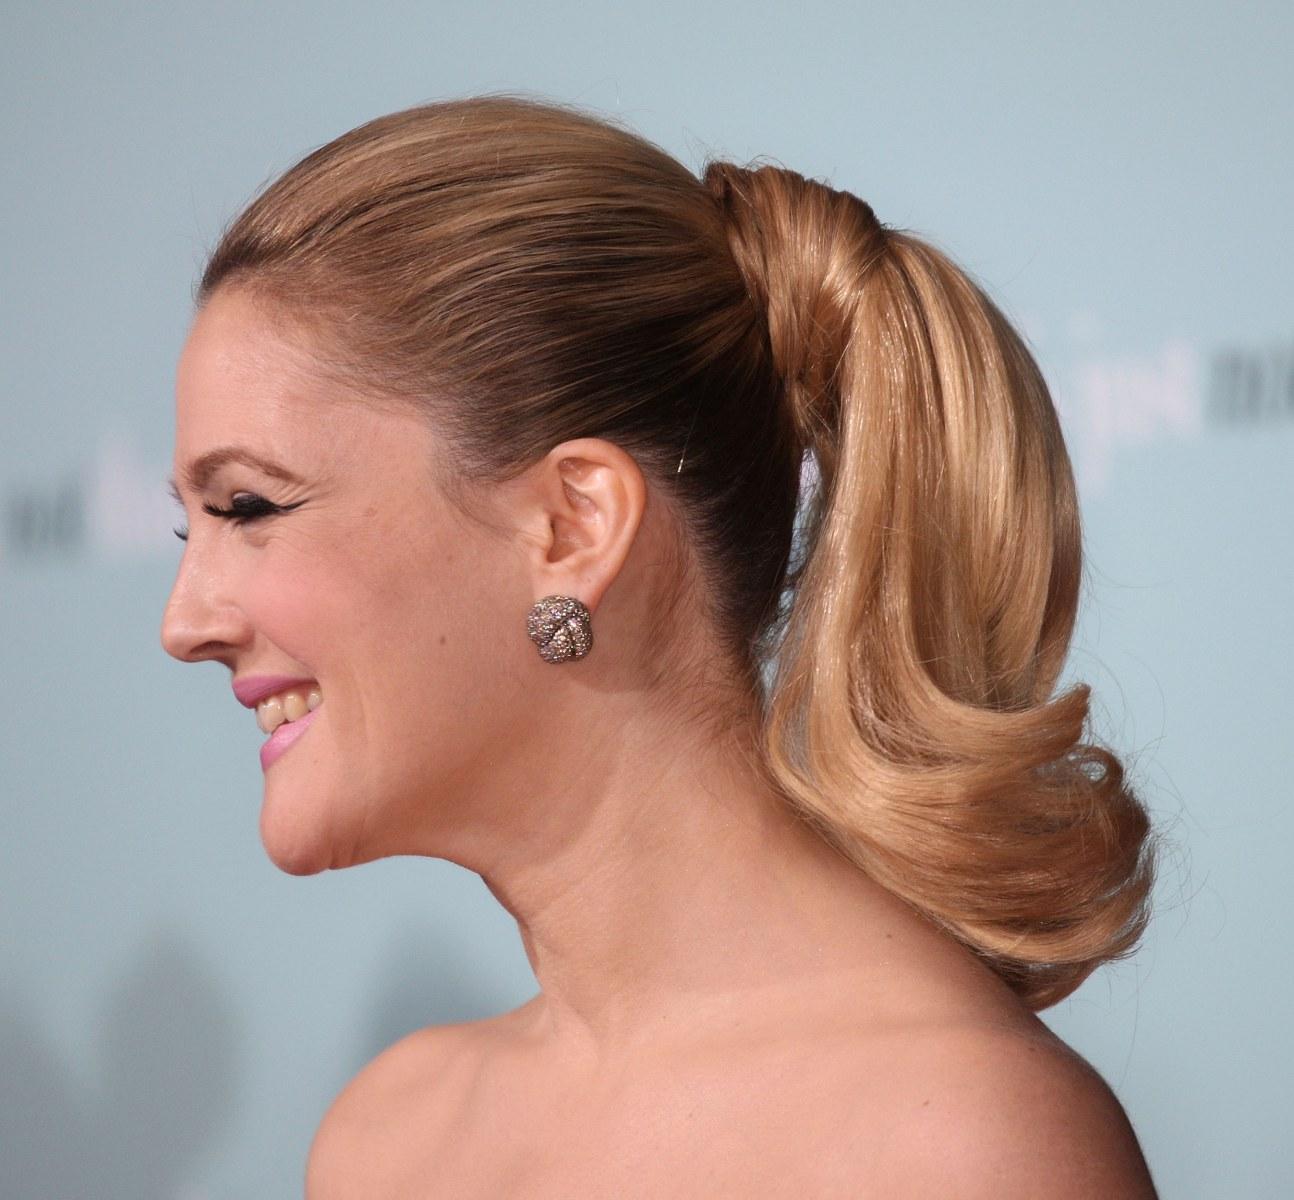 Drew Barrymore's hair evolution  TODAY.com